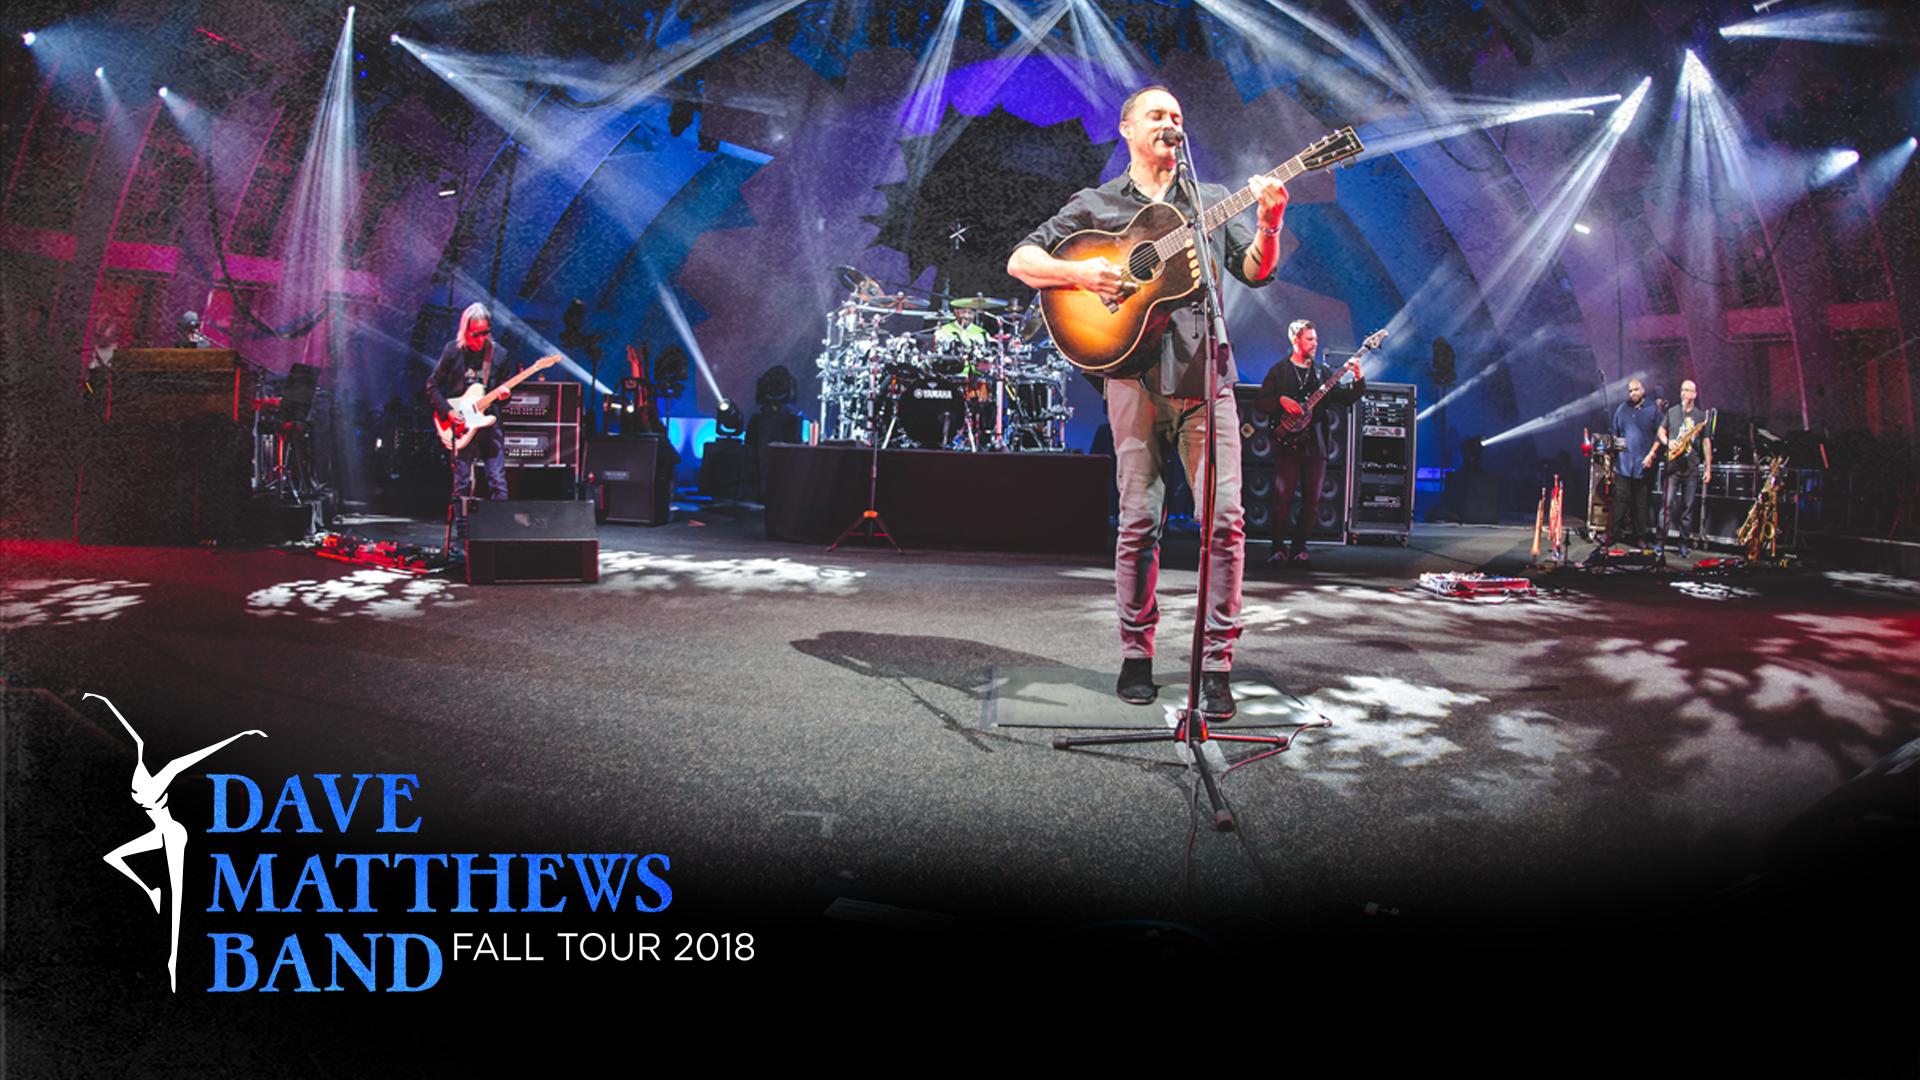 Dave Matthews Band Fall Tour